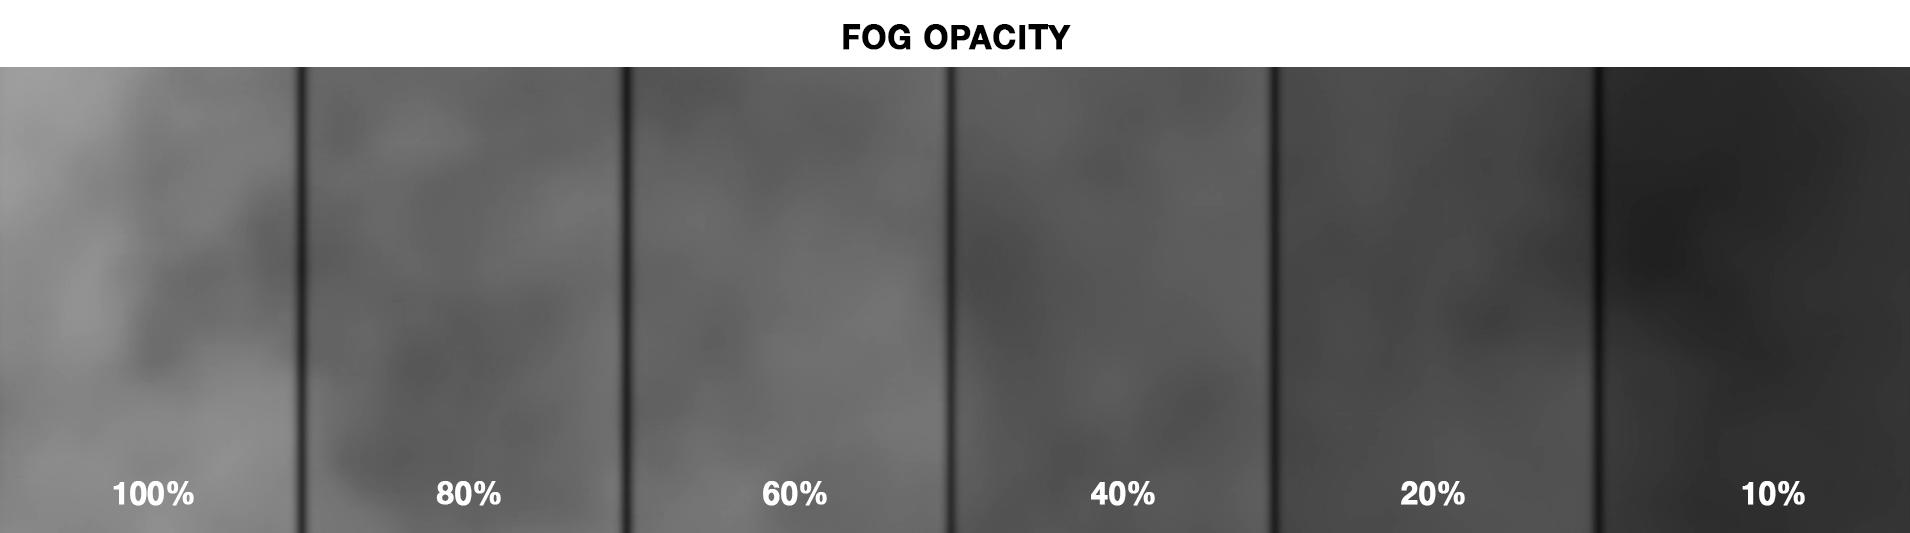 walk into fog - gradient